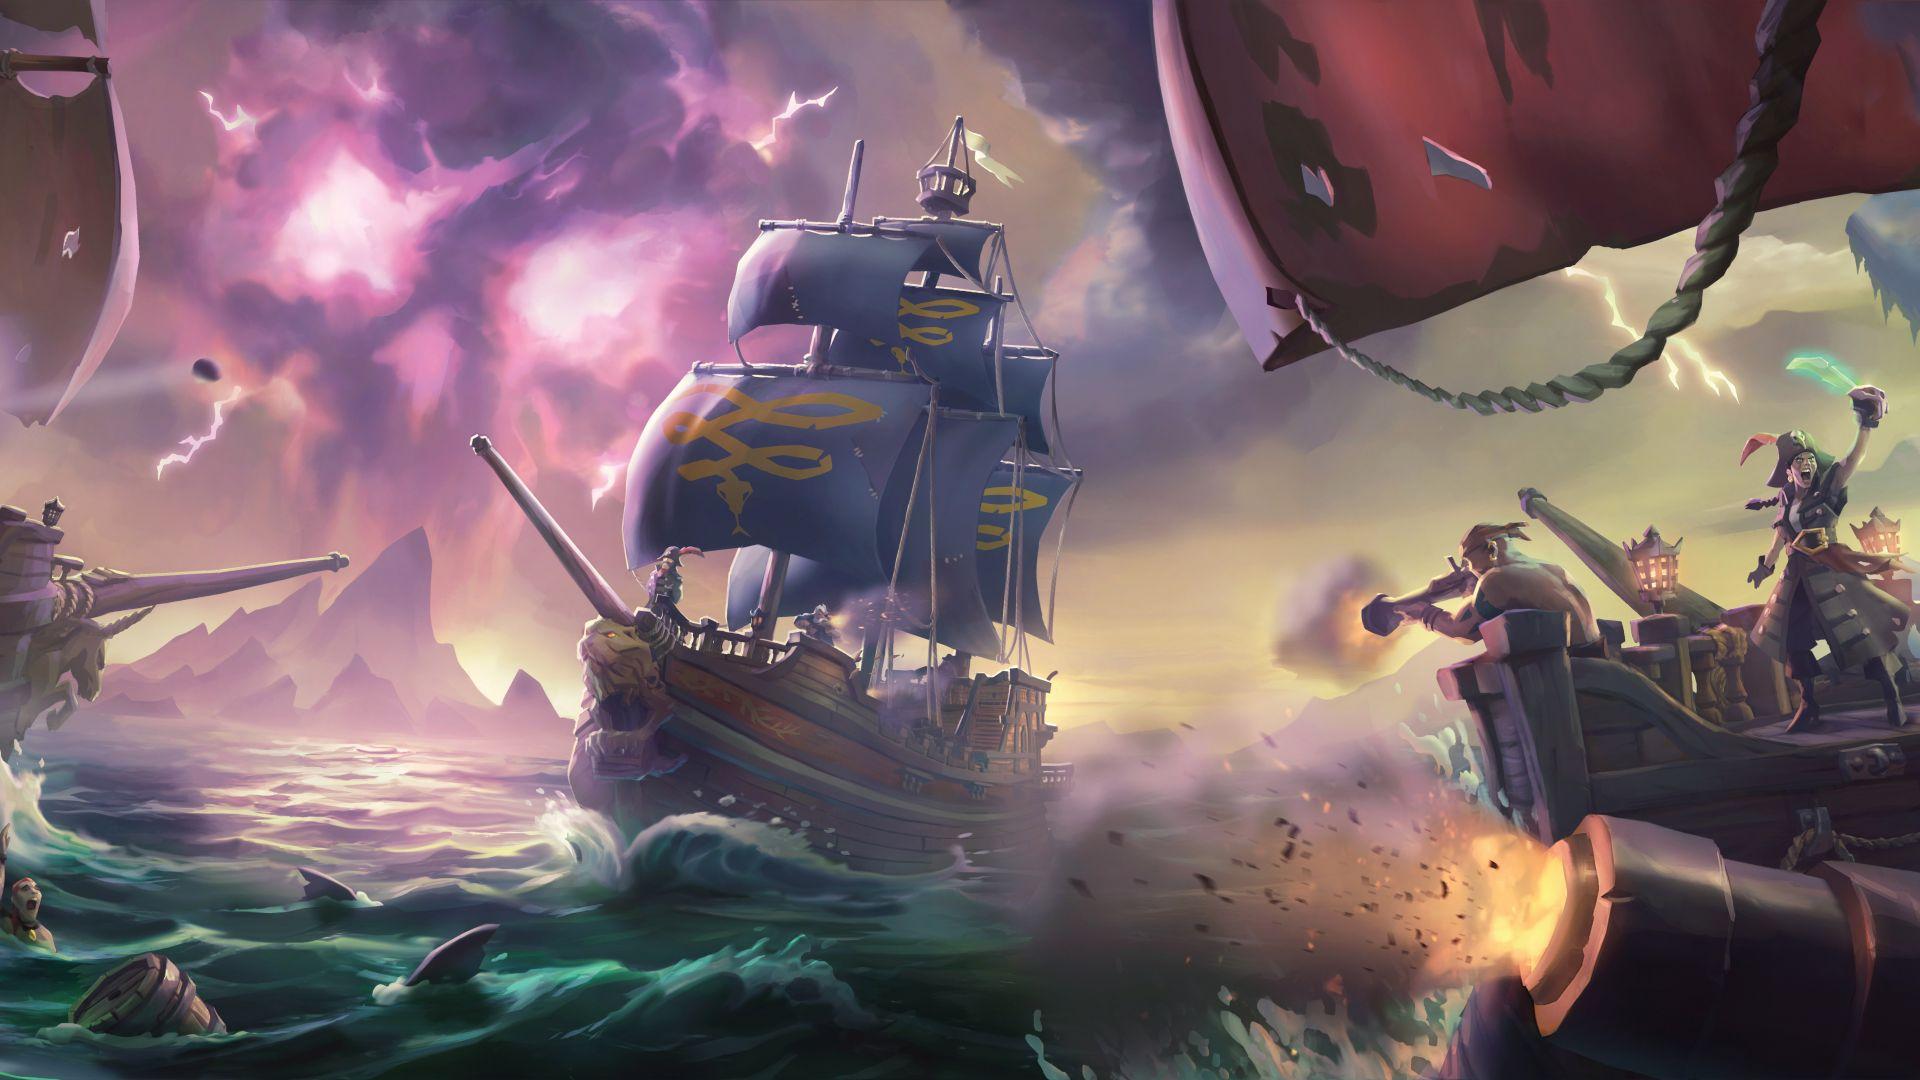 Wallpaper Sea of Thieves, video game, 2017 game, 4k, 5k